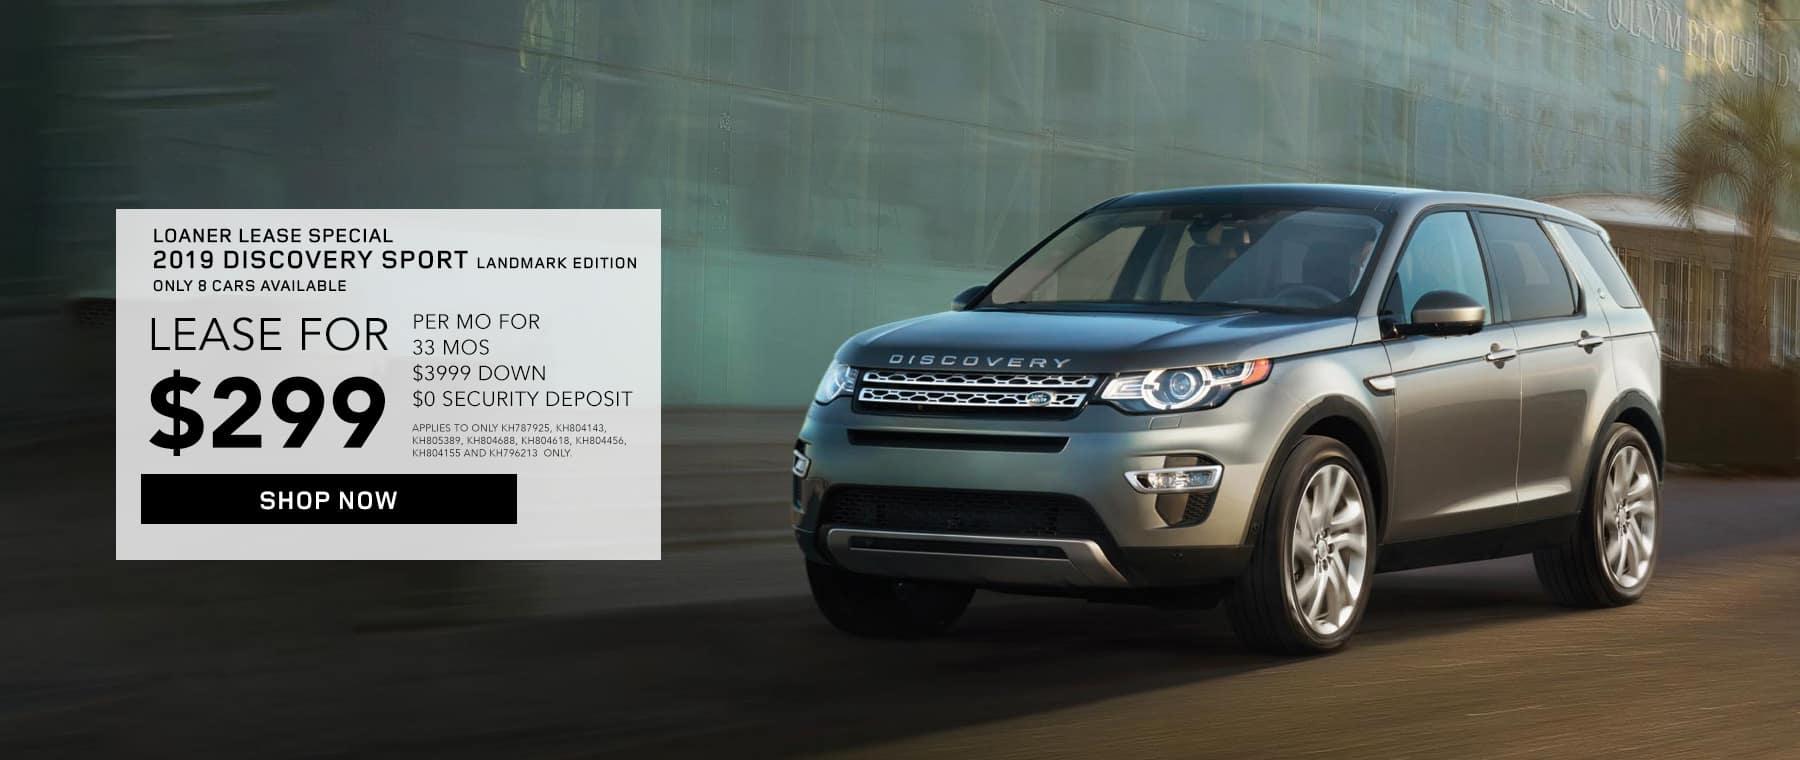 Land Rover Darien >> Land Rover Darien New Used Land Rovers In Darien Ct